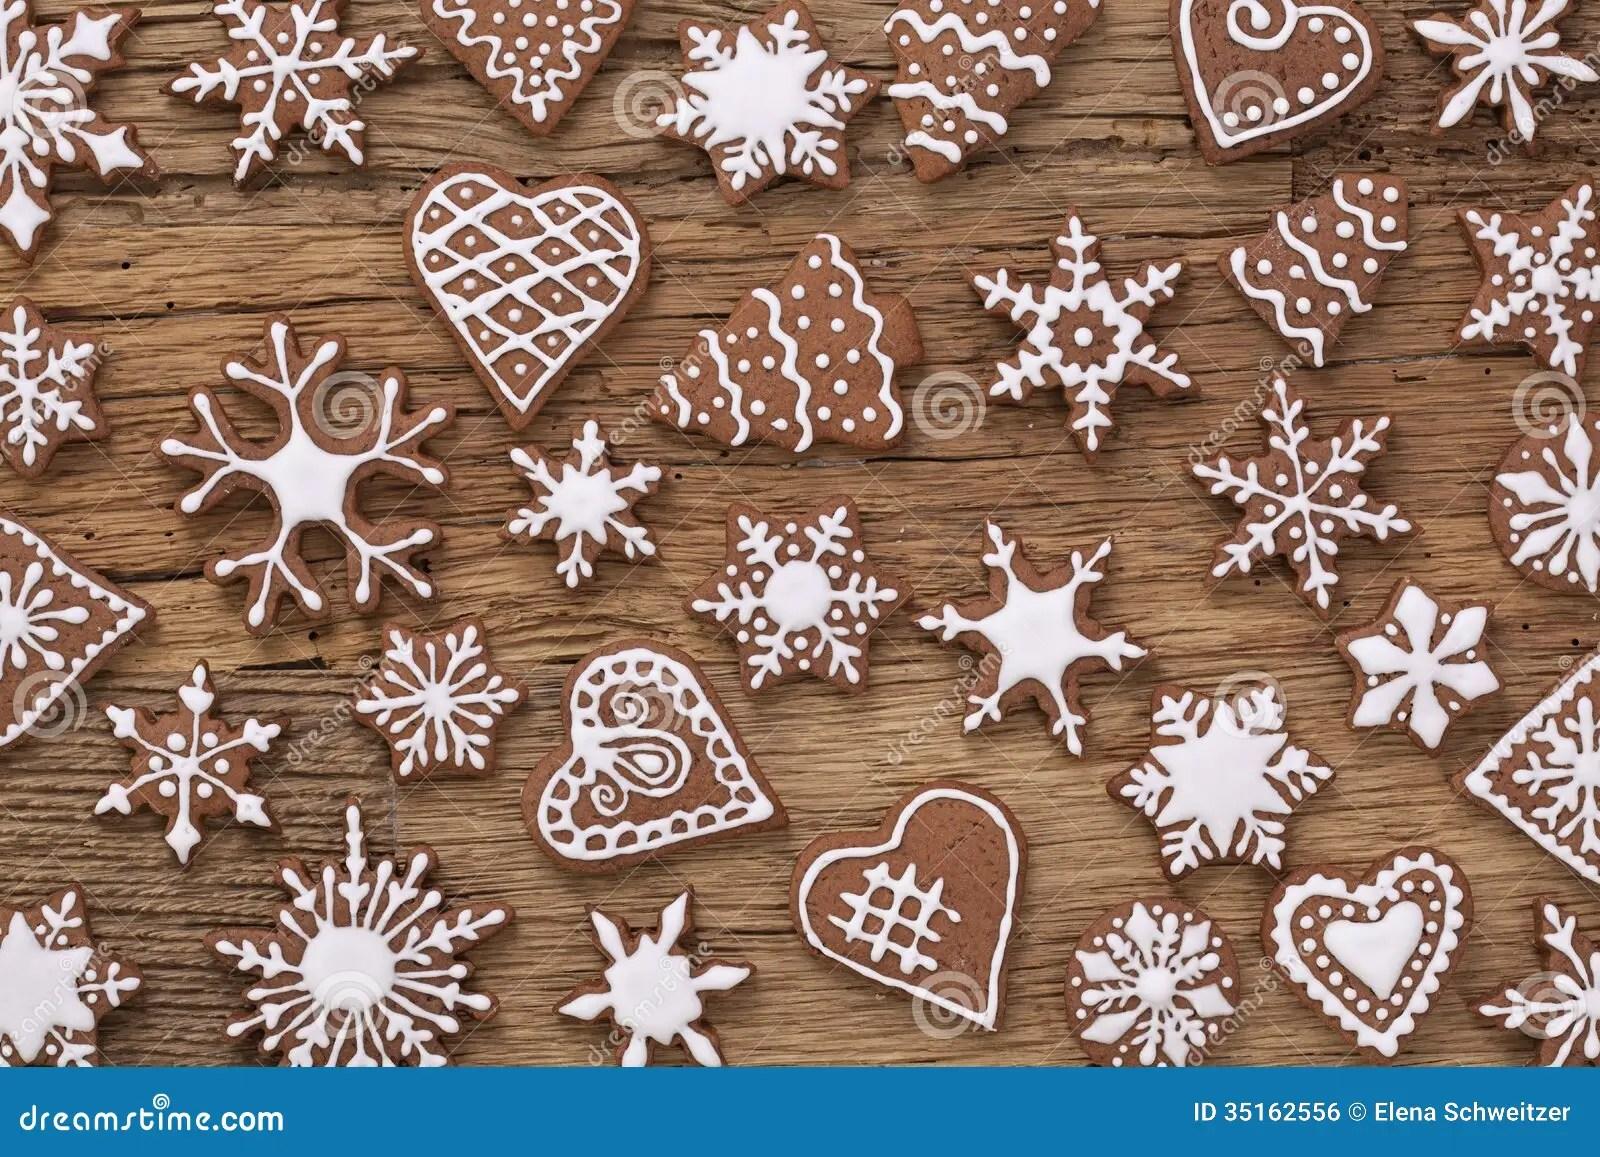 Xmas Cute Wallpaper Gingerbread Cookies Royalty Free Stock Image Image 35162556